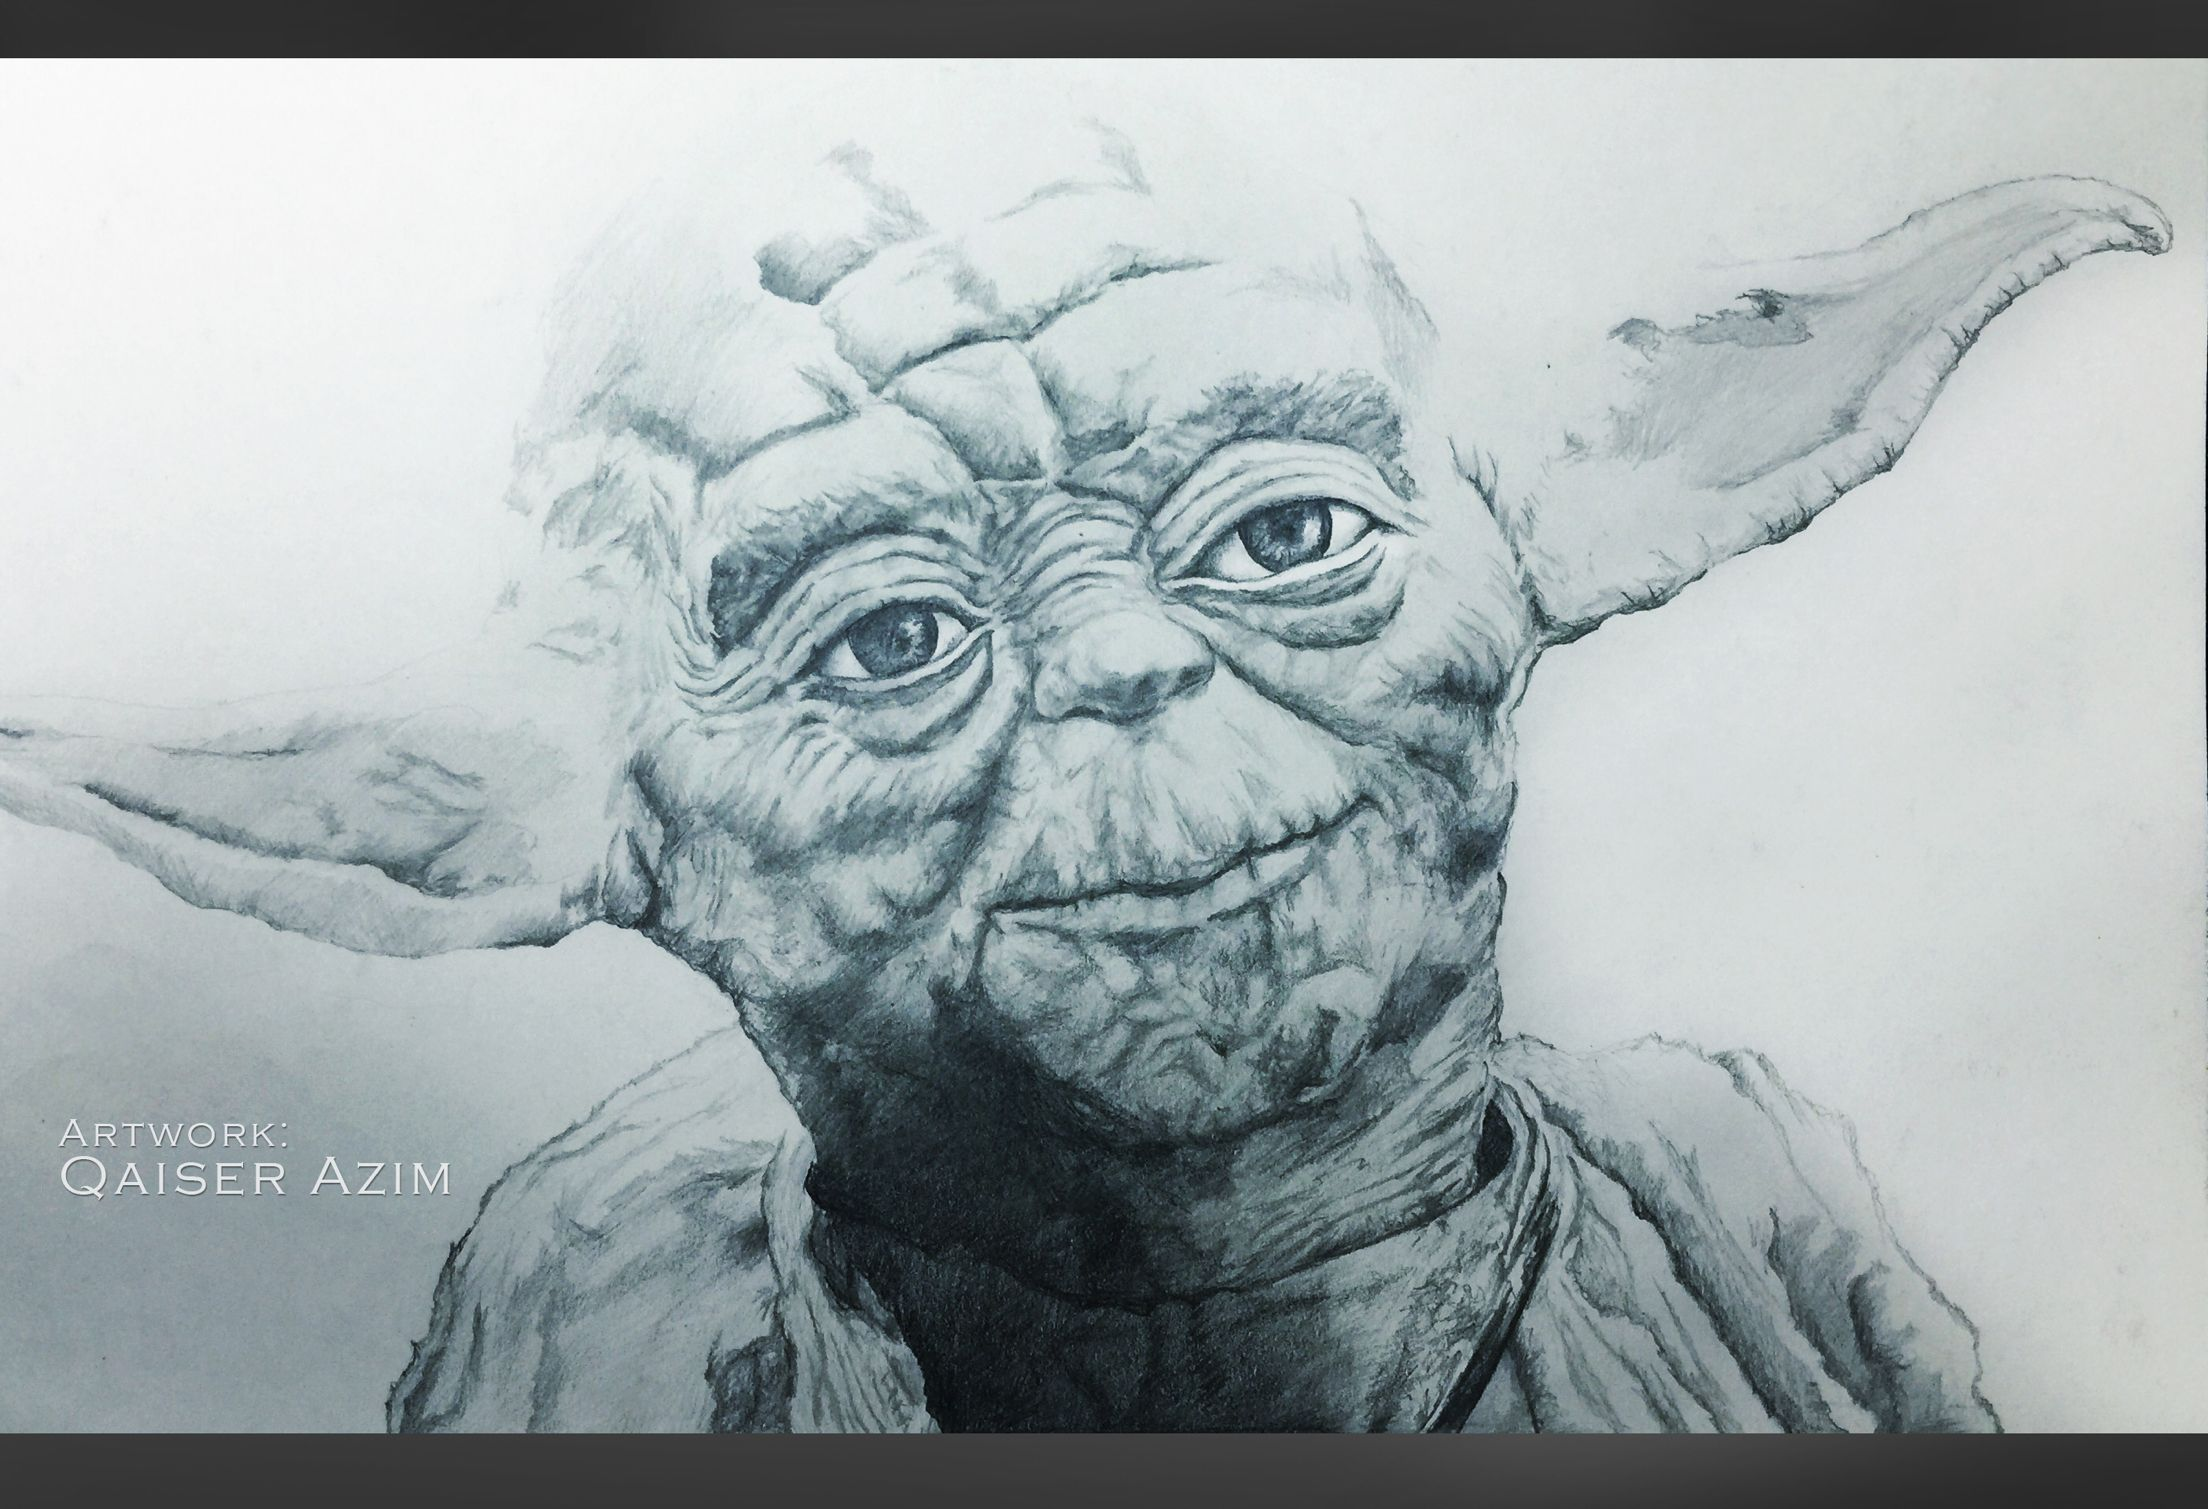 2208x1509 Yoda Pencil Sketch. Movie Art By Qaiser Movie